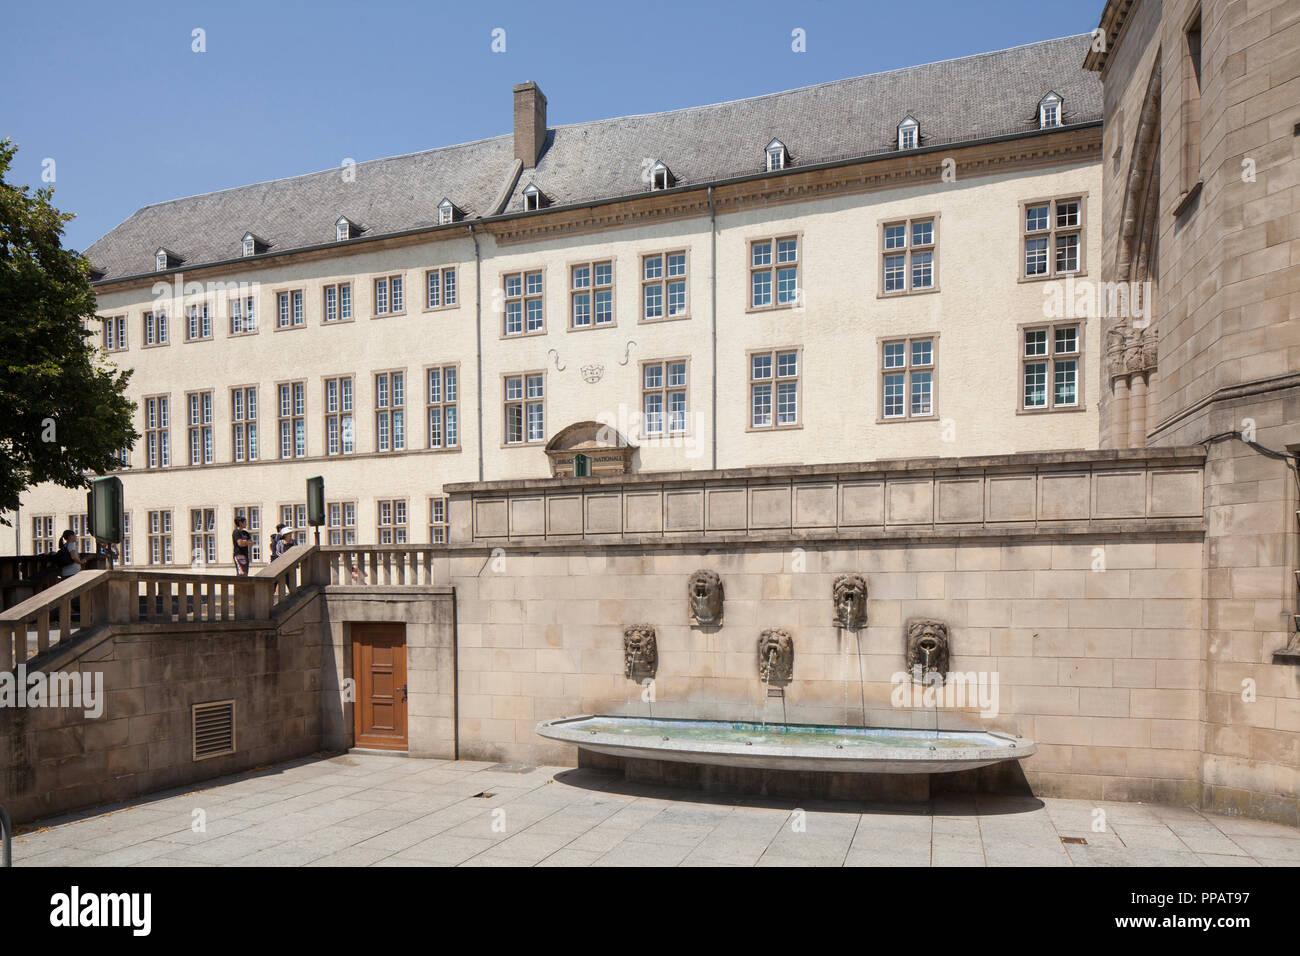 Zentralbibliothek im Gebäudekomplex des ehemaligen Jesuitenkollegs, Springbrunnen, der Stadt Luxemburg, Luxemburg, Europa ich Nationalbibliothek im Gebäudekomp Stockfoto